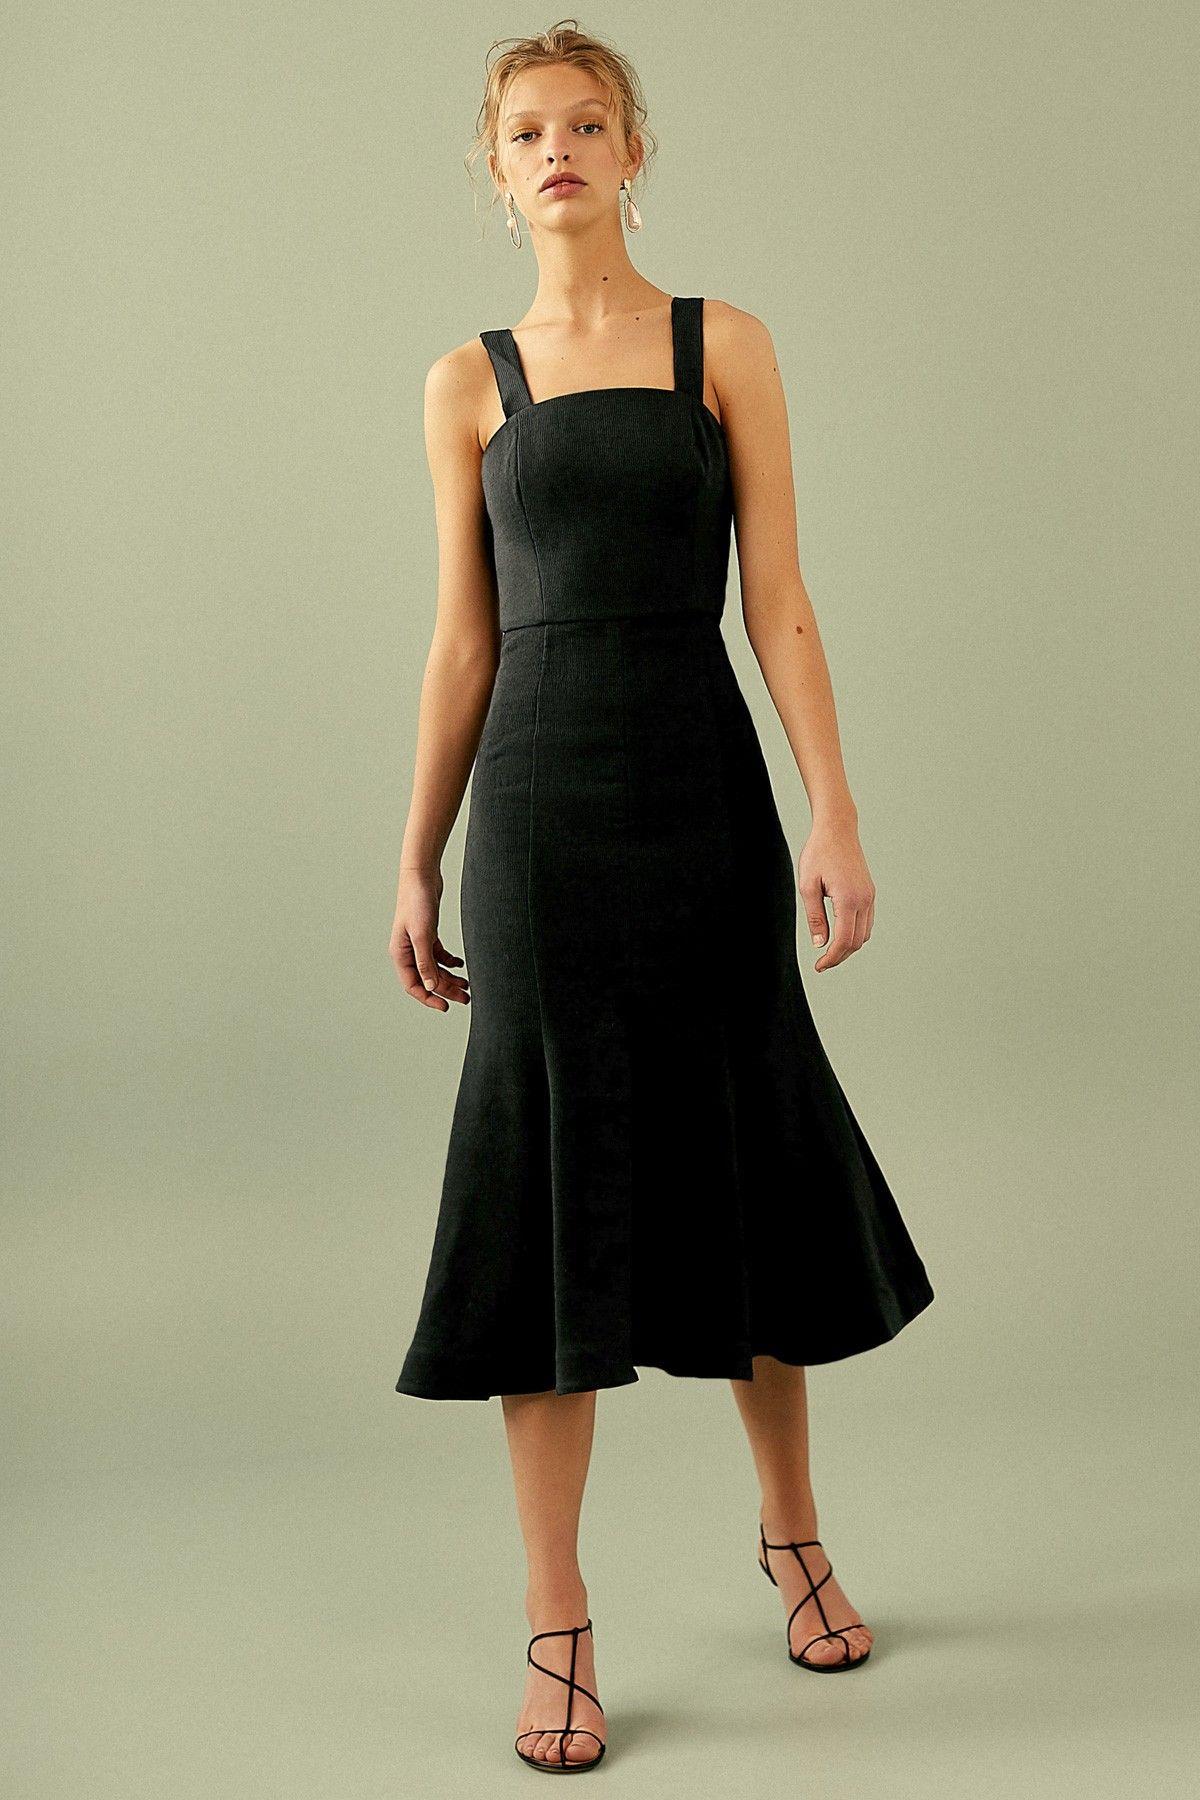 Apex Midi Dress Black C Meo Collective Bnkr Dresses Prom Midi Dress Black Midi Dress [ 1800 x 1200 Pixel ]